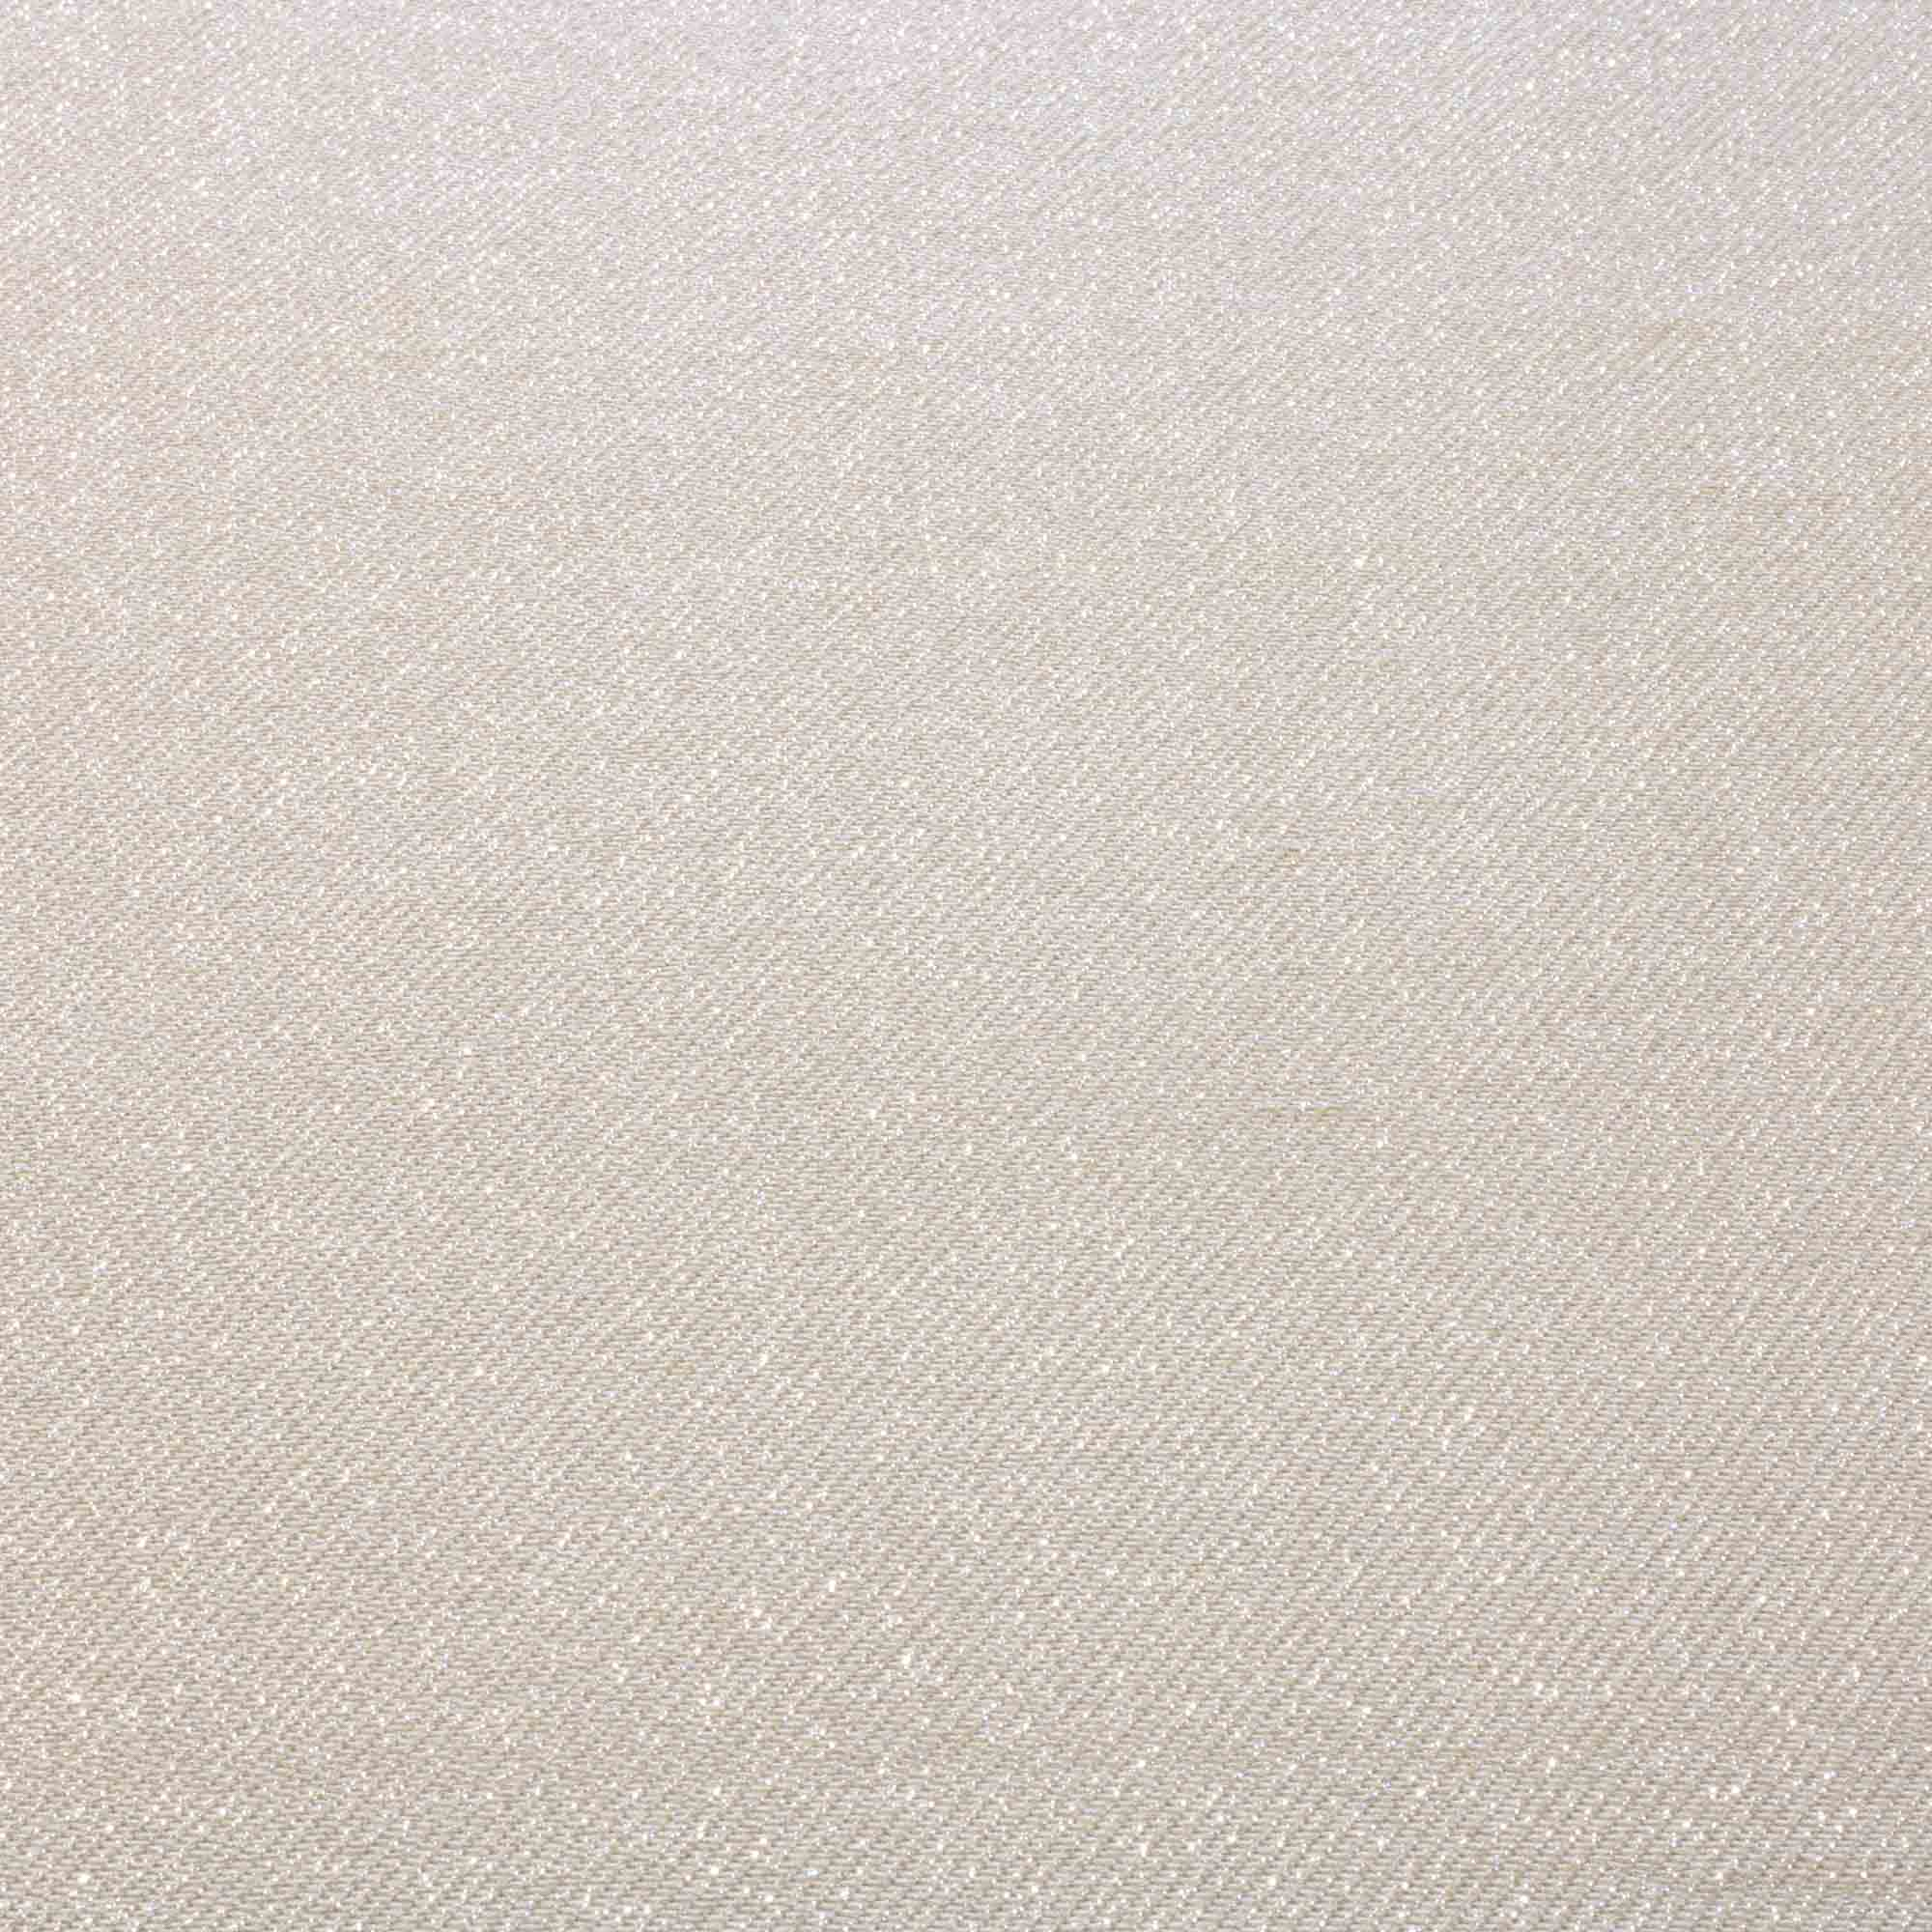 Tecido Lurex Branco Gelo Brilho Fios Prata 1,70 Mt Largura